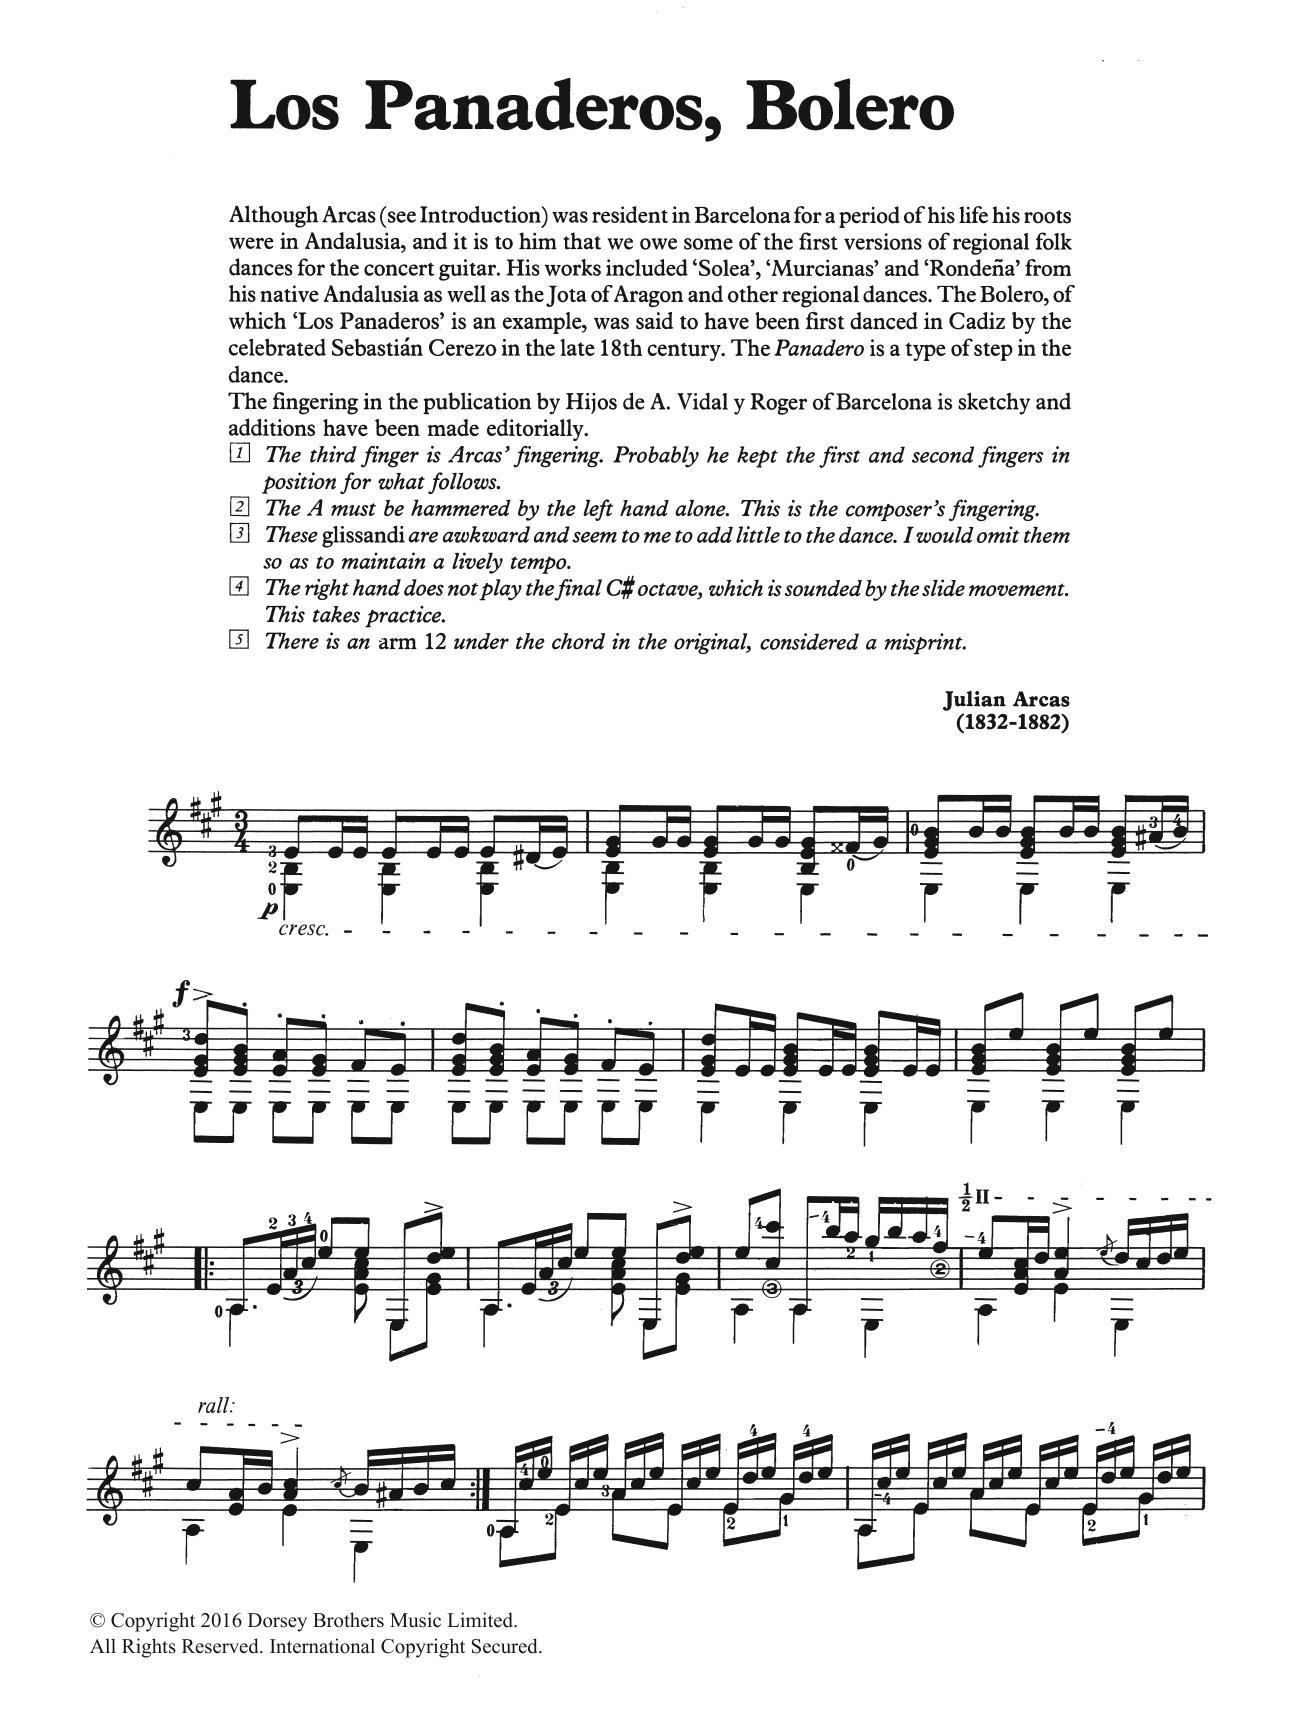 Los Panaderos, Bolero Sheet Music